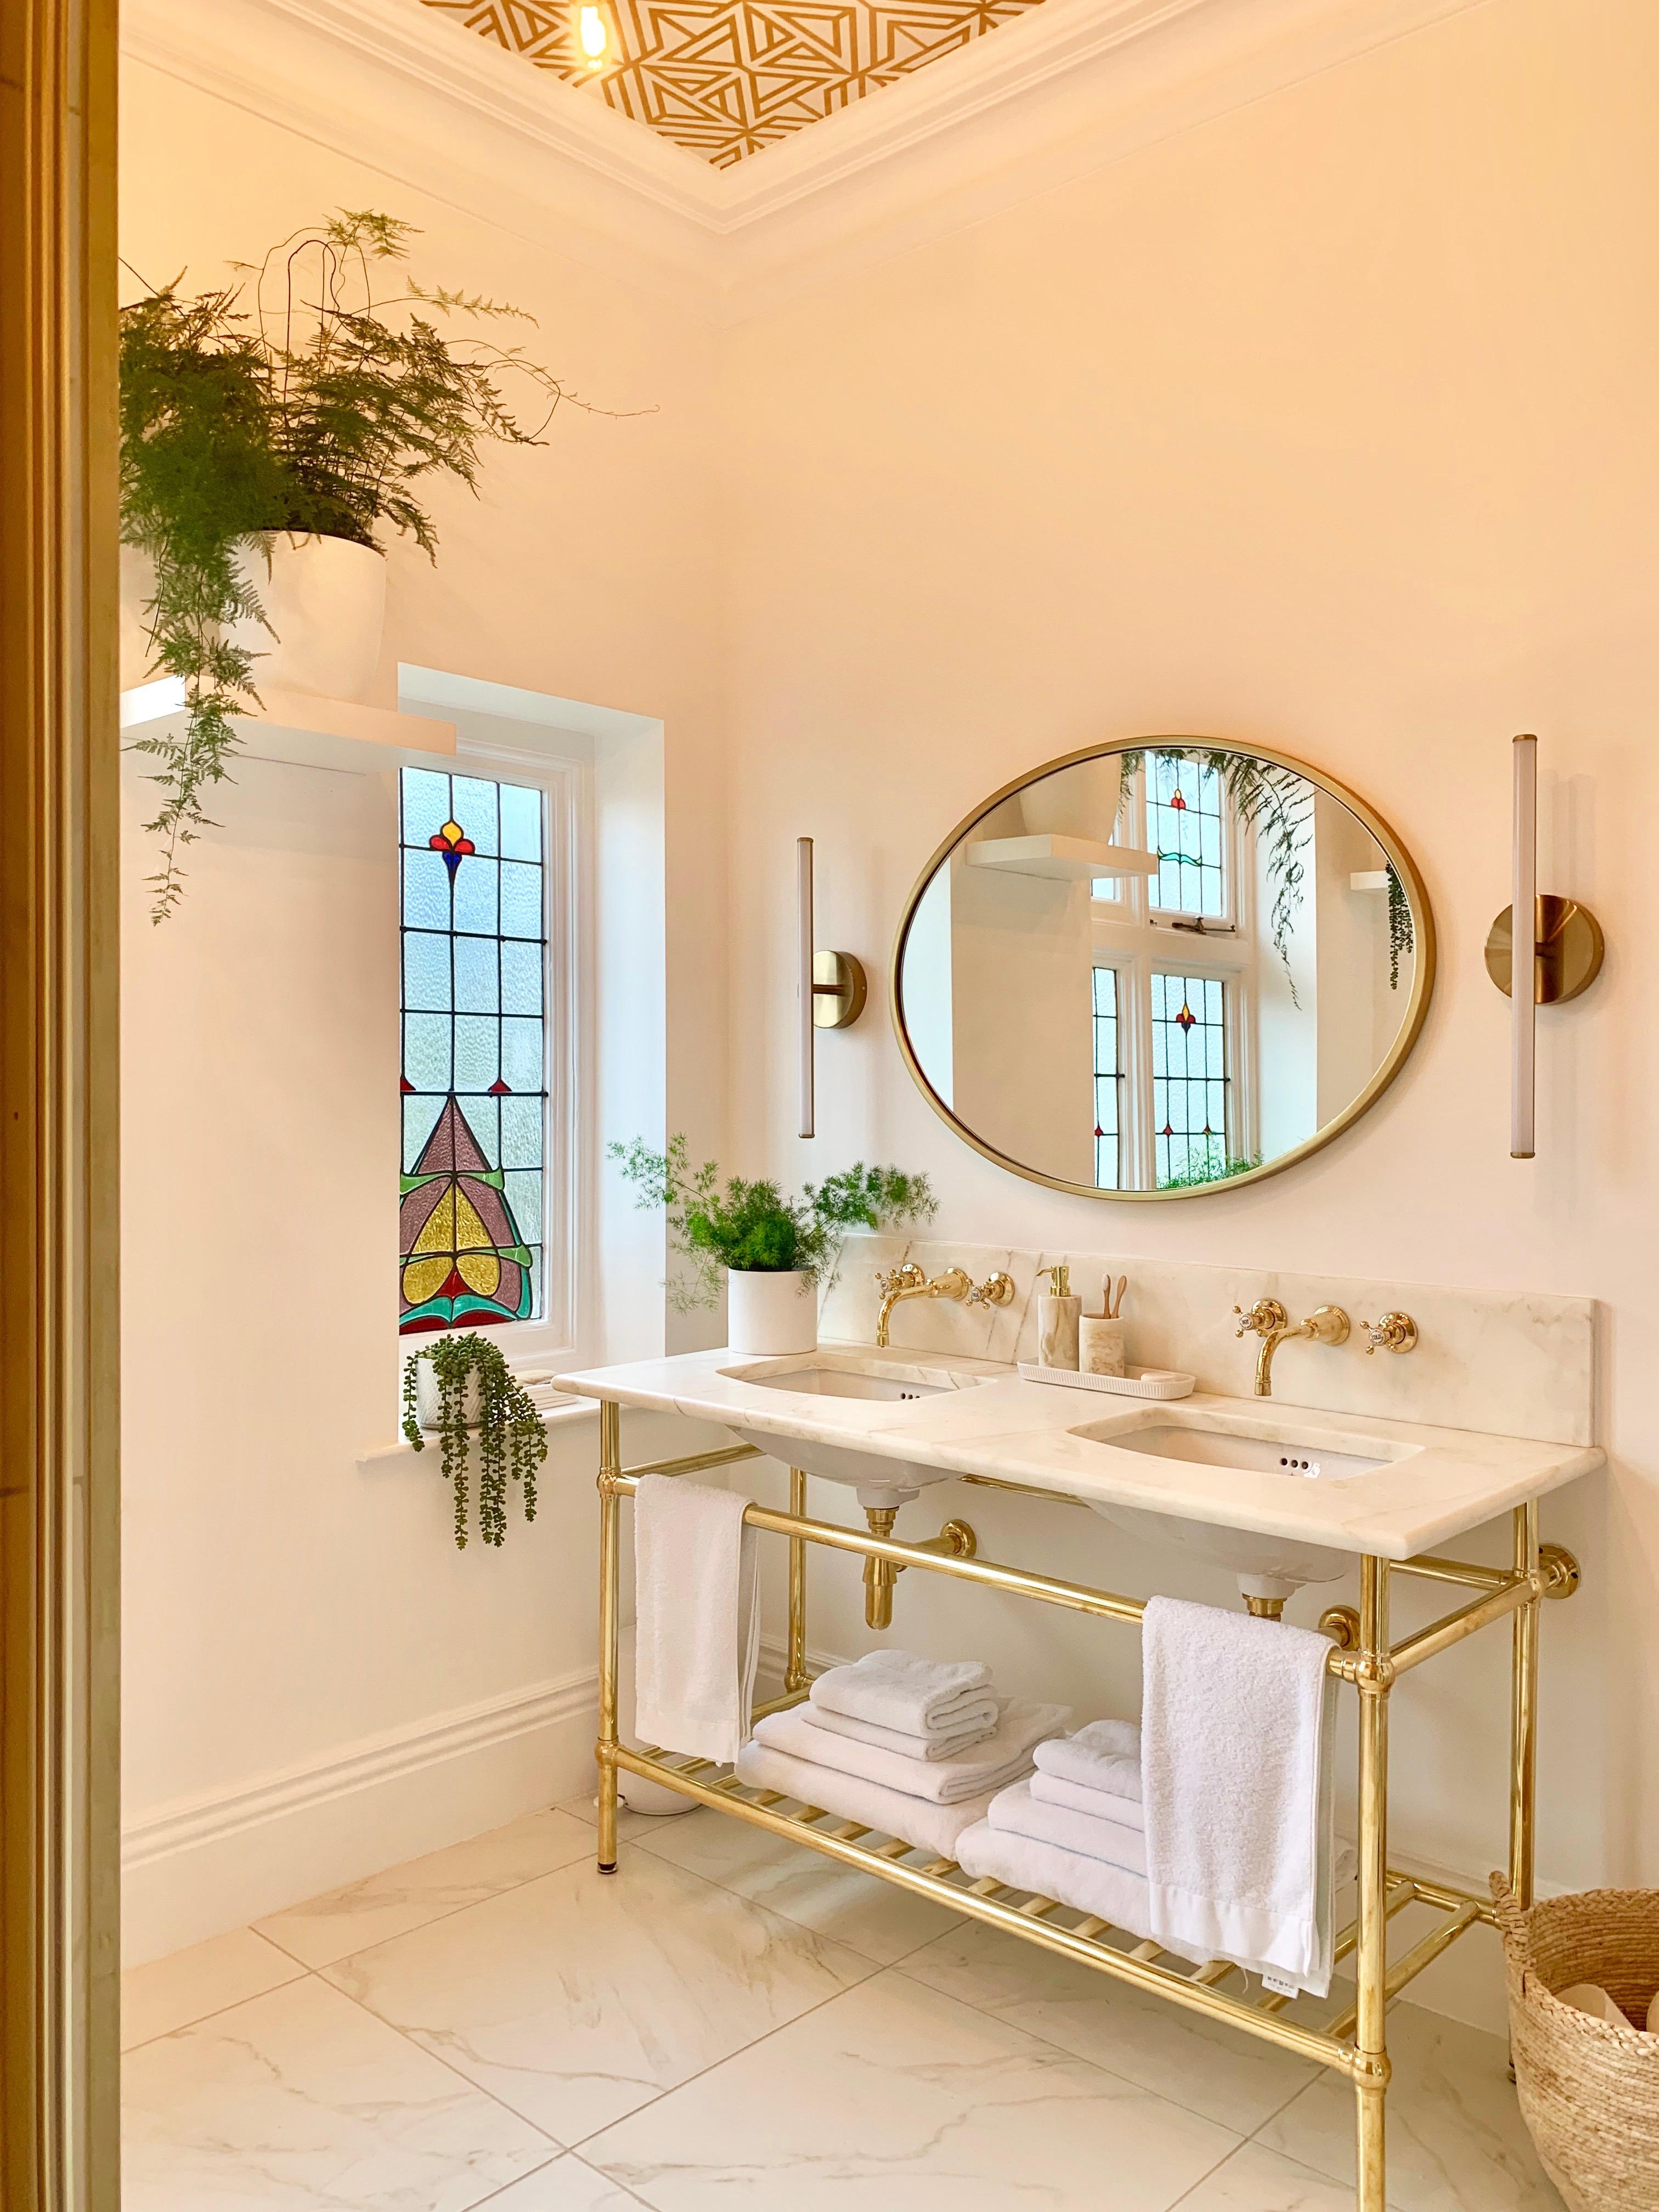 bathroom vanity unit polished brass frame marble floor tiles brass taps faucets